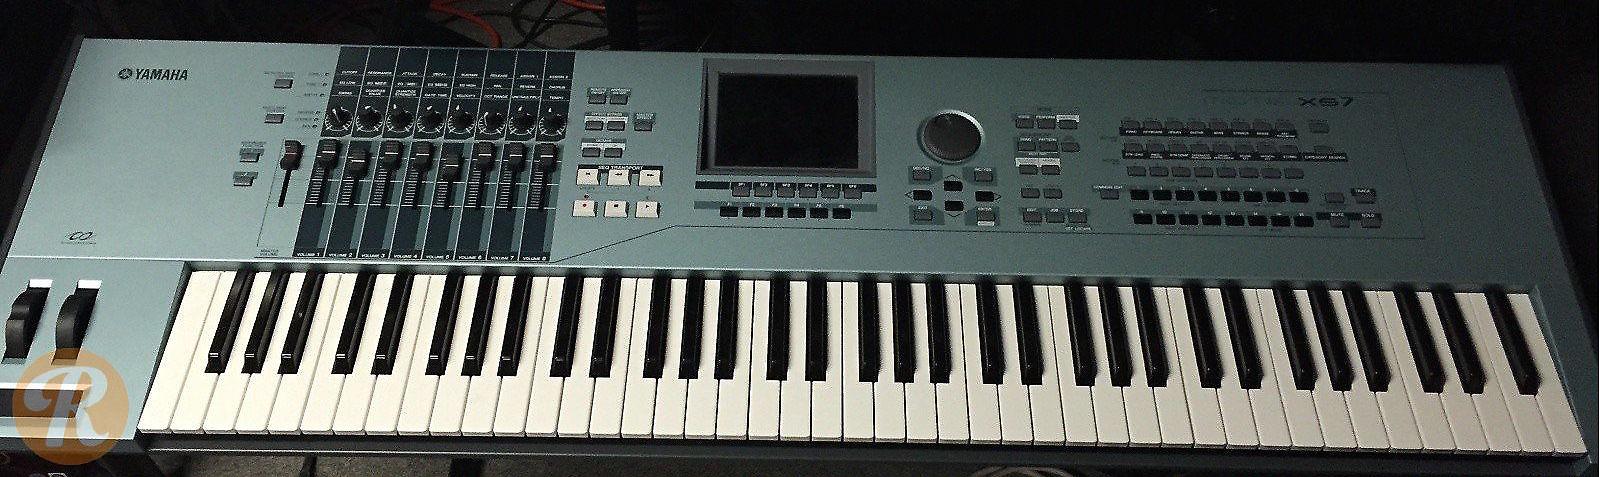 Yamaha Motif XS 7 | Reverb